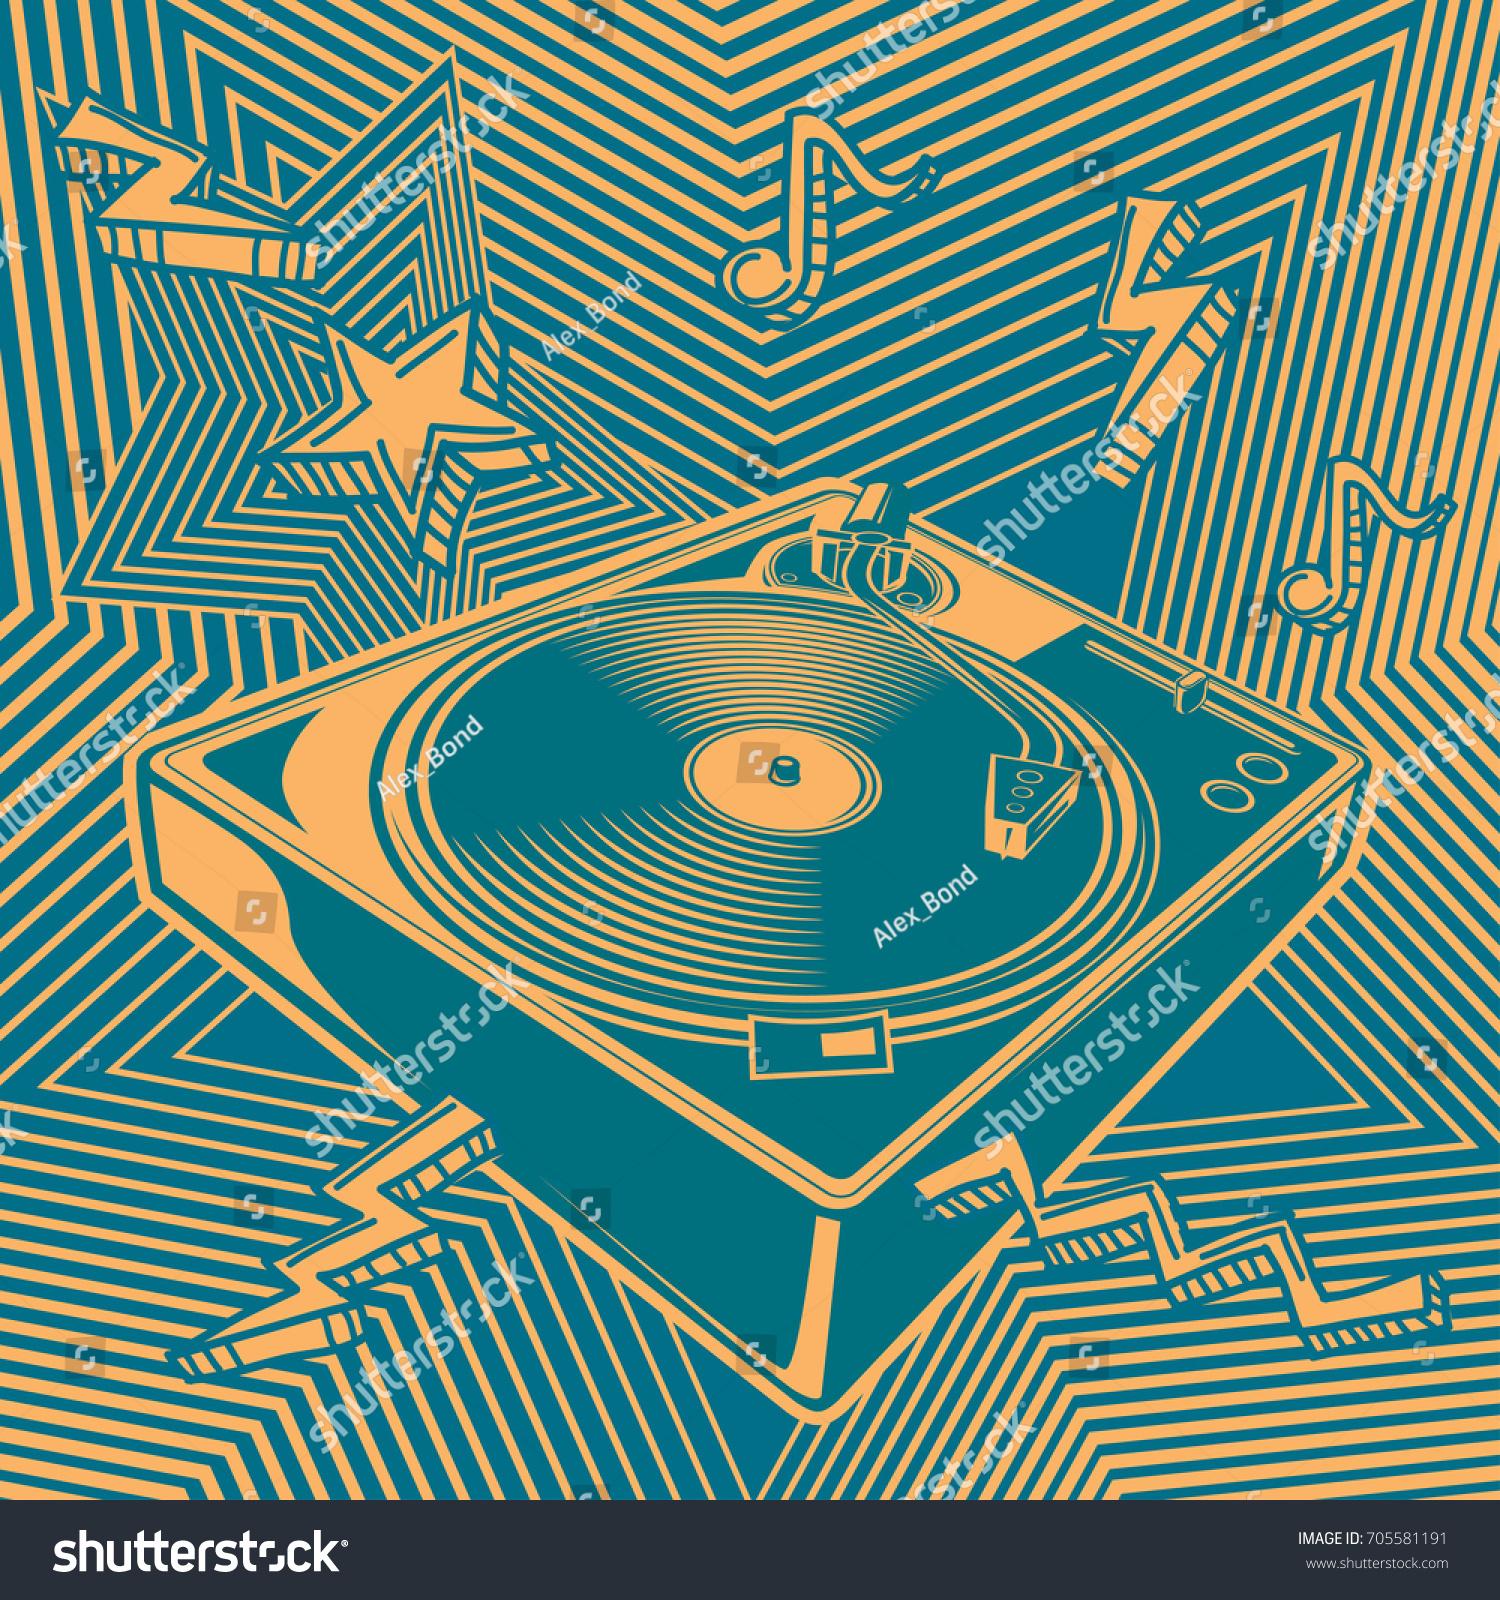 Turntable music design